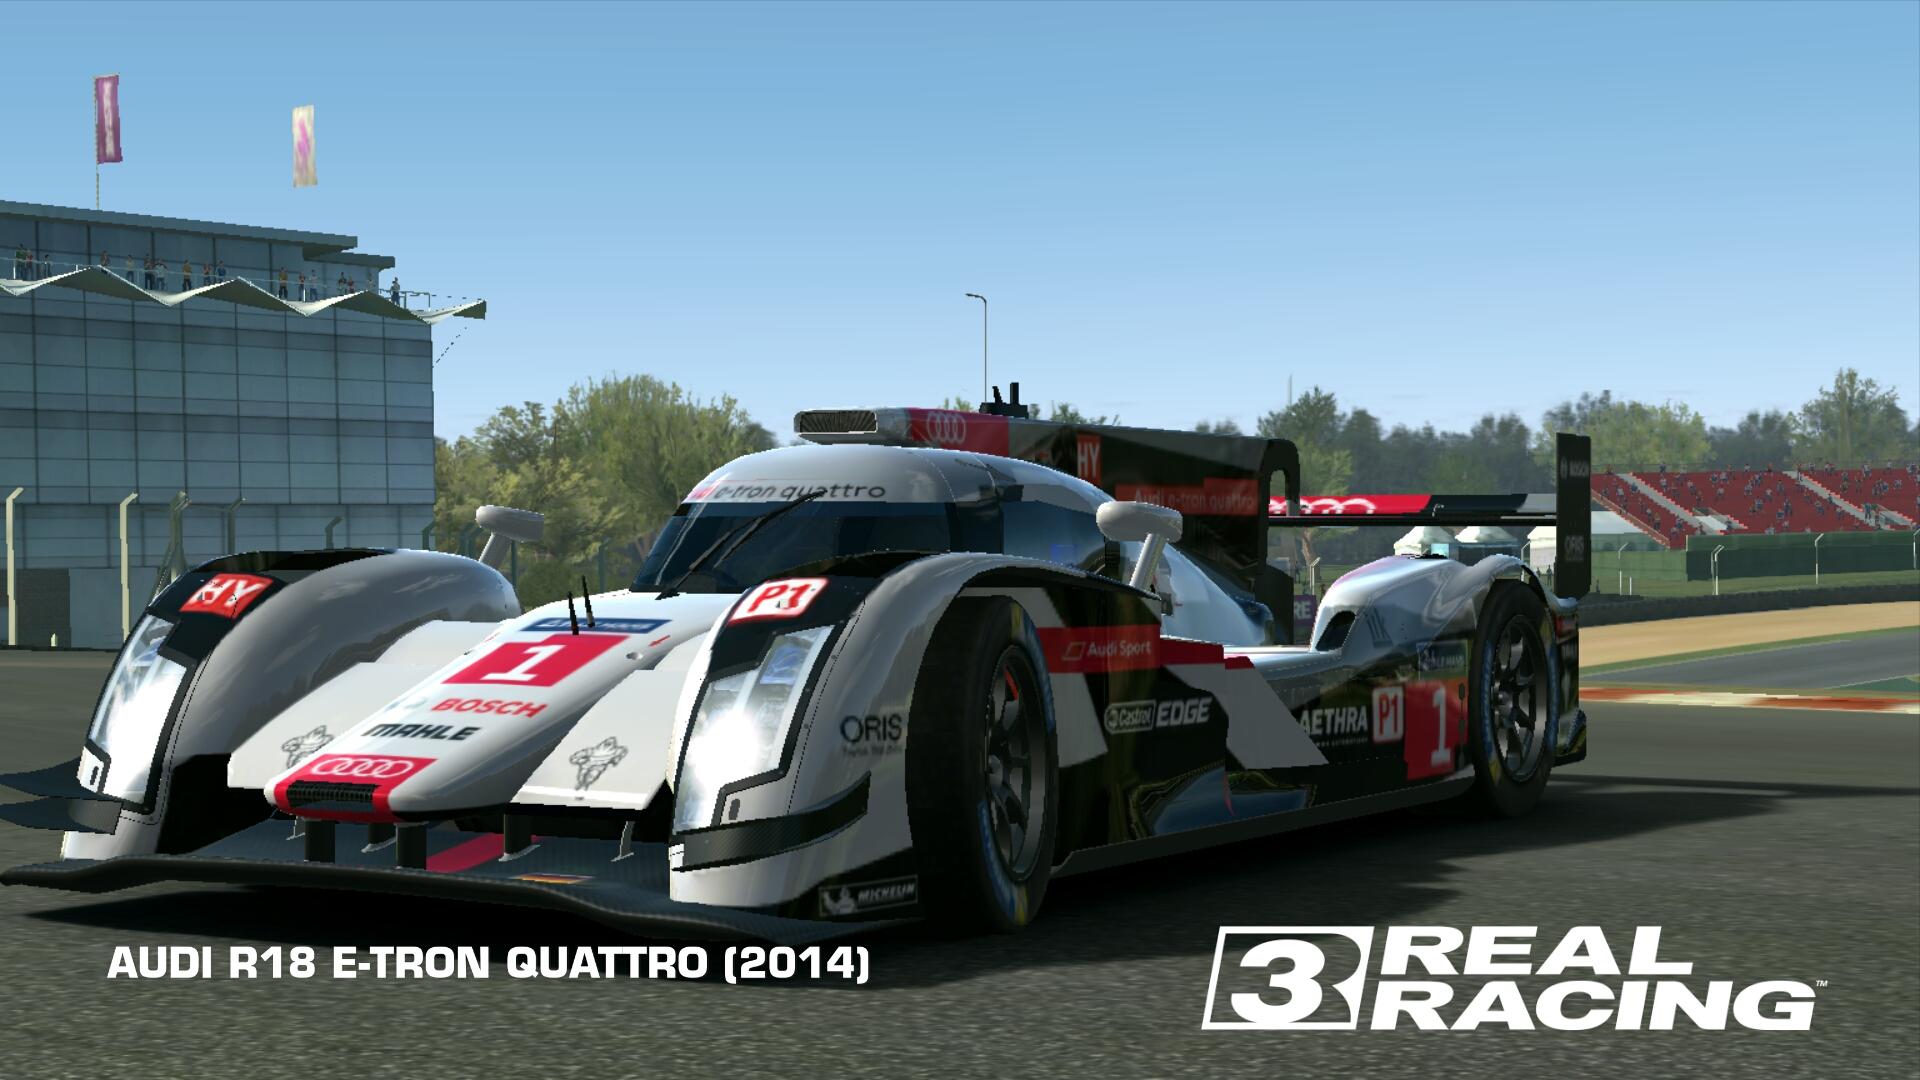 AUDI R ETRON QUATTRO Real Racing Wiki FANDOM Powered - Audi r18 e tron quattro